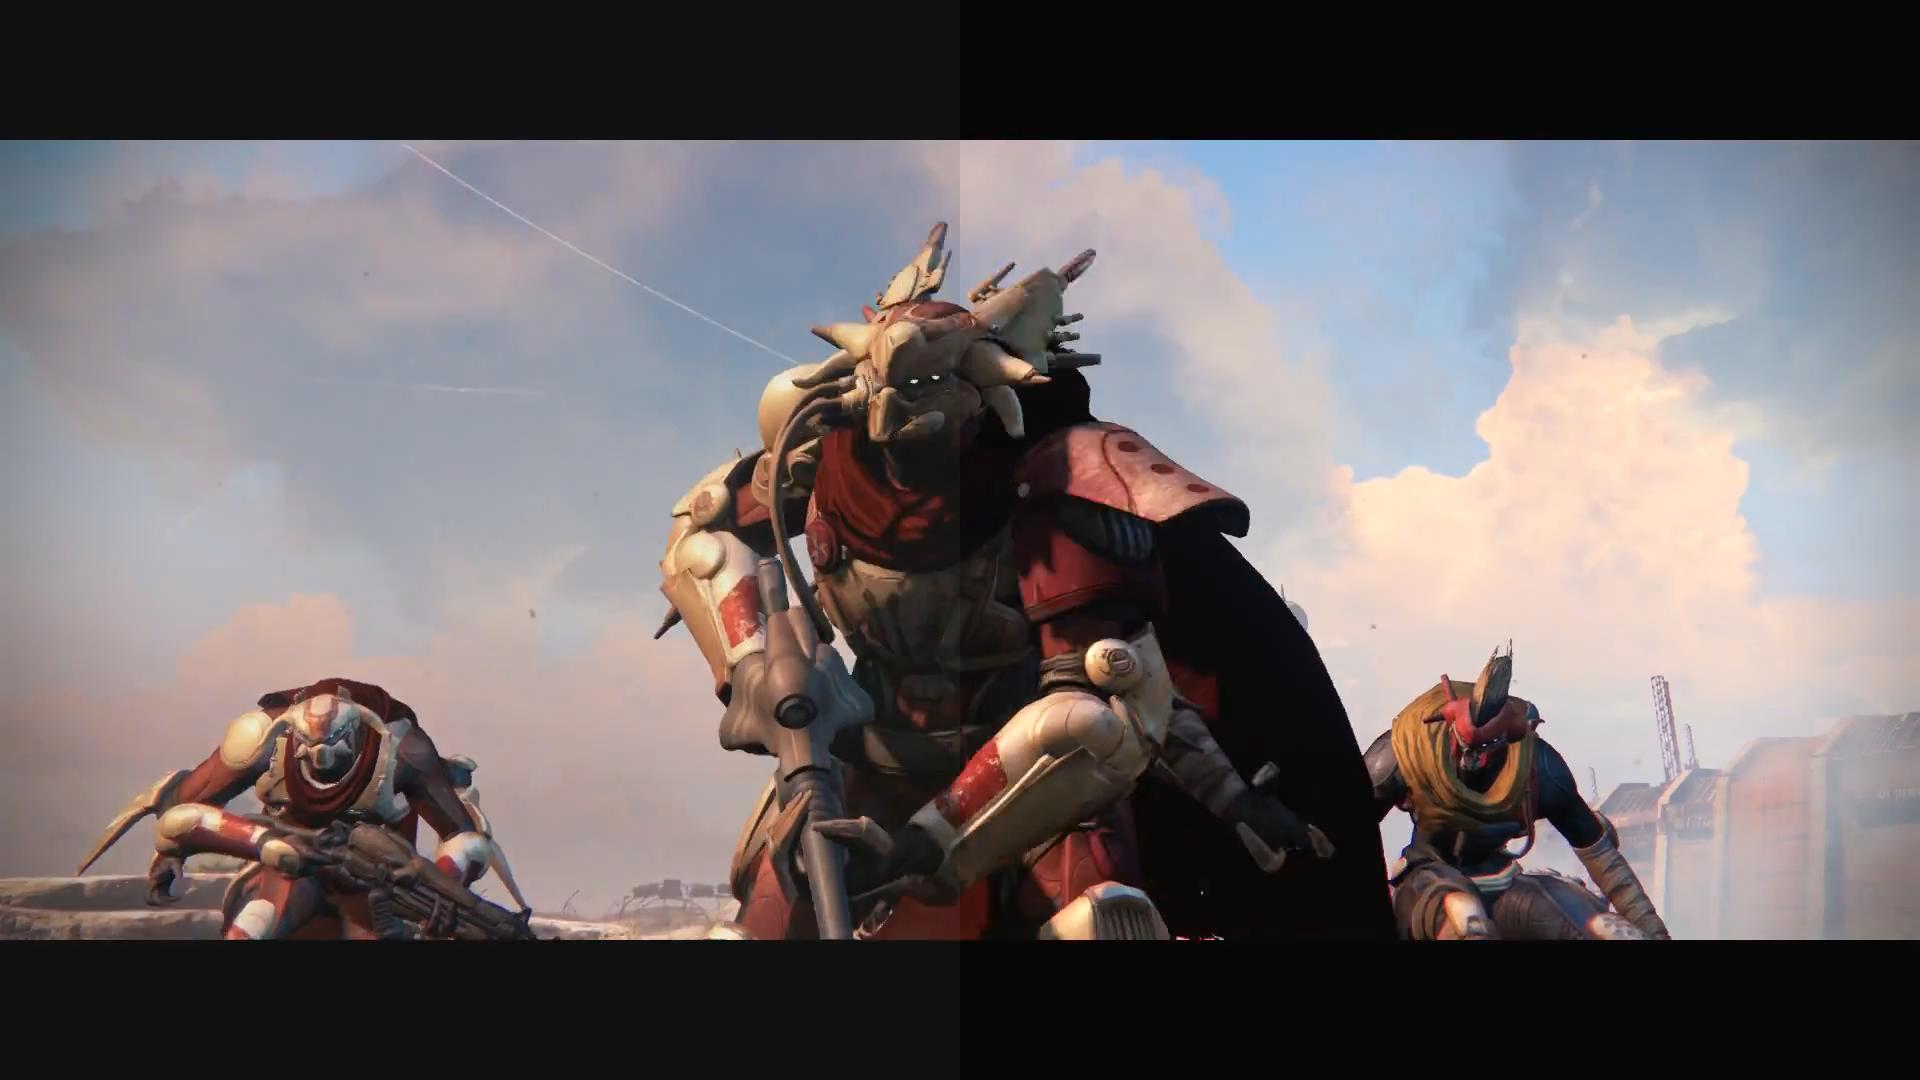 Destiny PS4 vs Xbox One